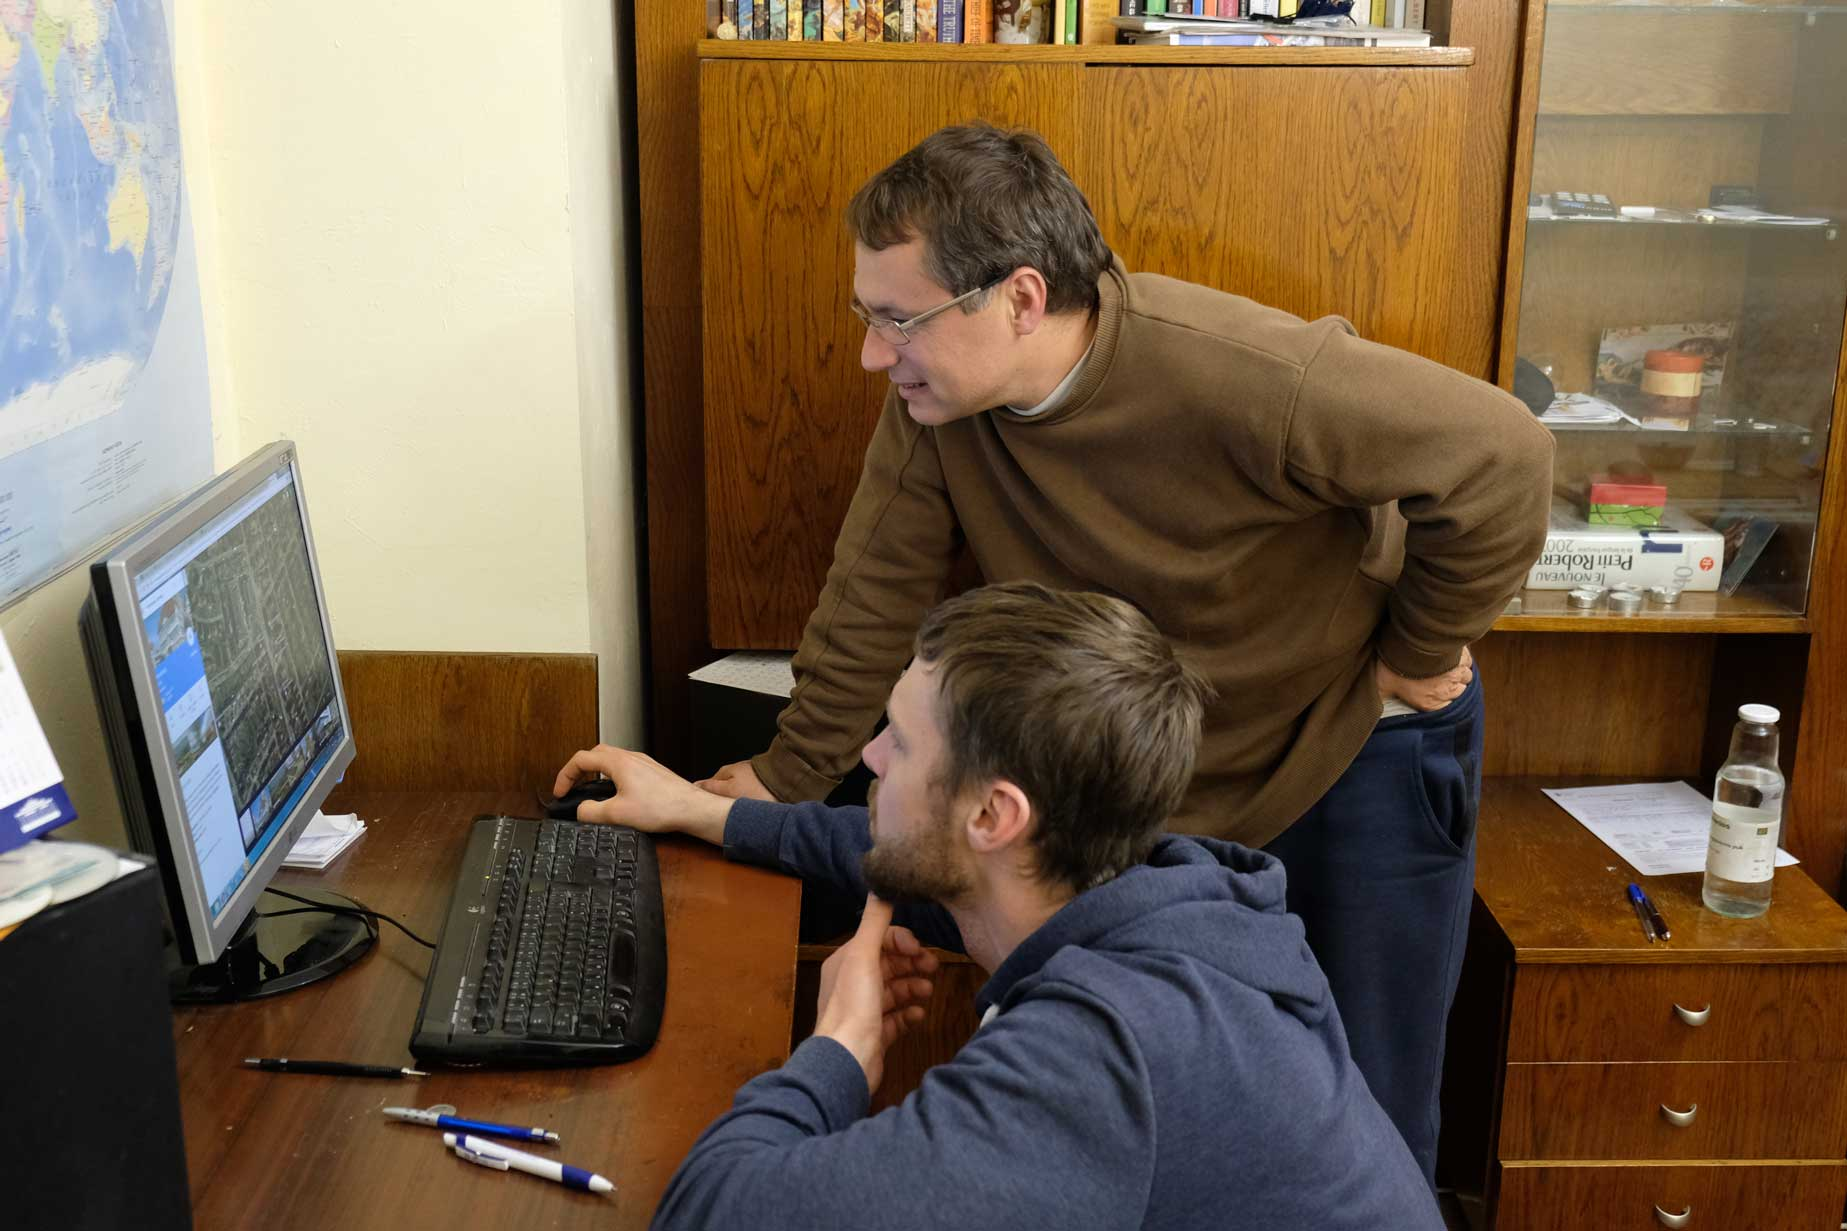 Sebastian und Petar ganz begeistert vor dem PC